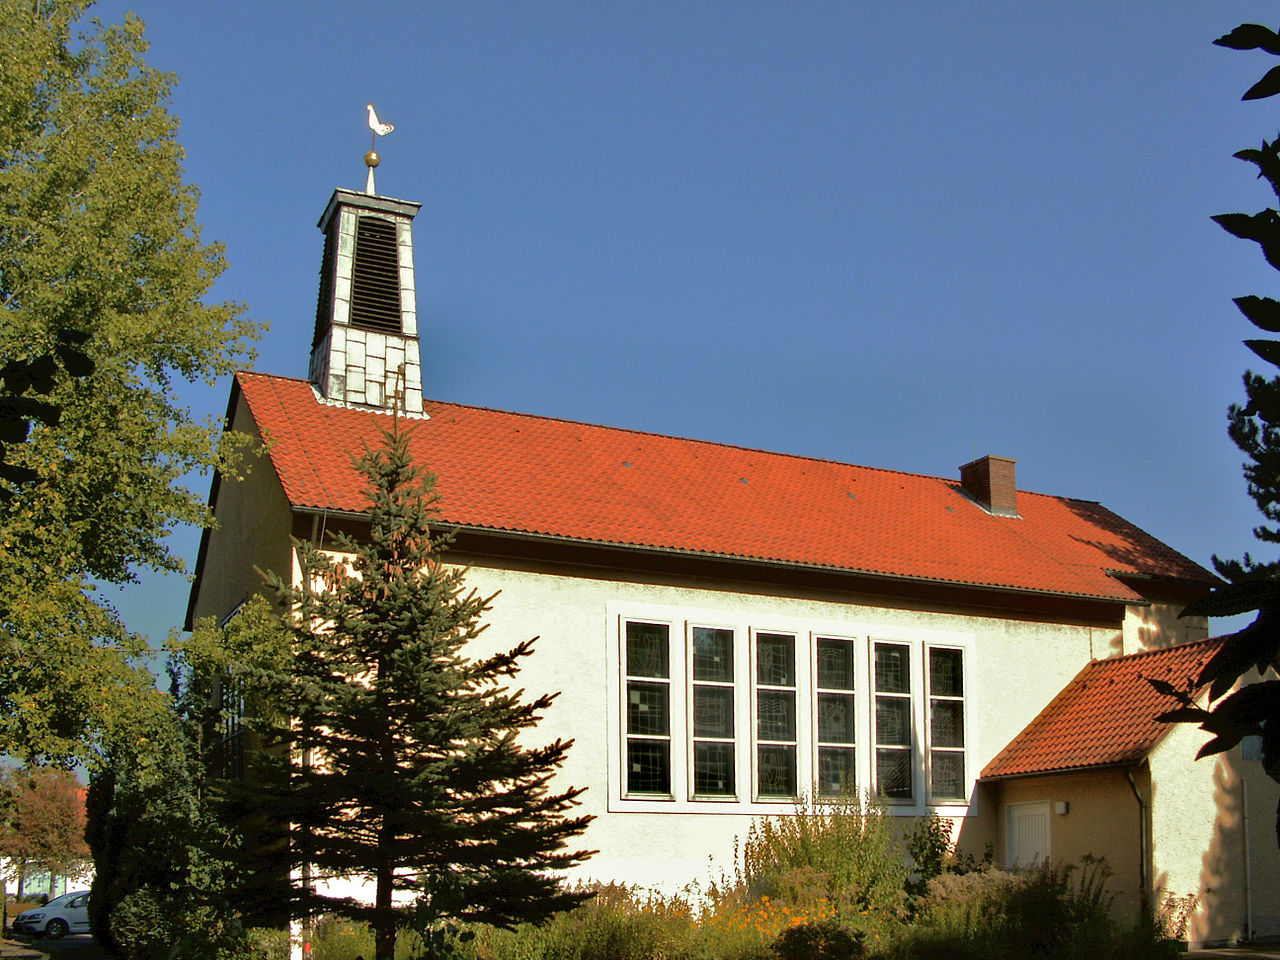 File:Bad Bevensen Kirche kath.jpg - Wikimedia Commons